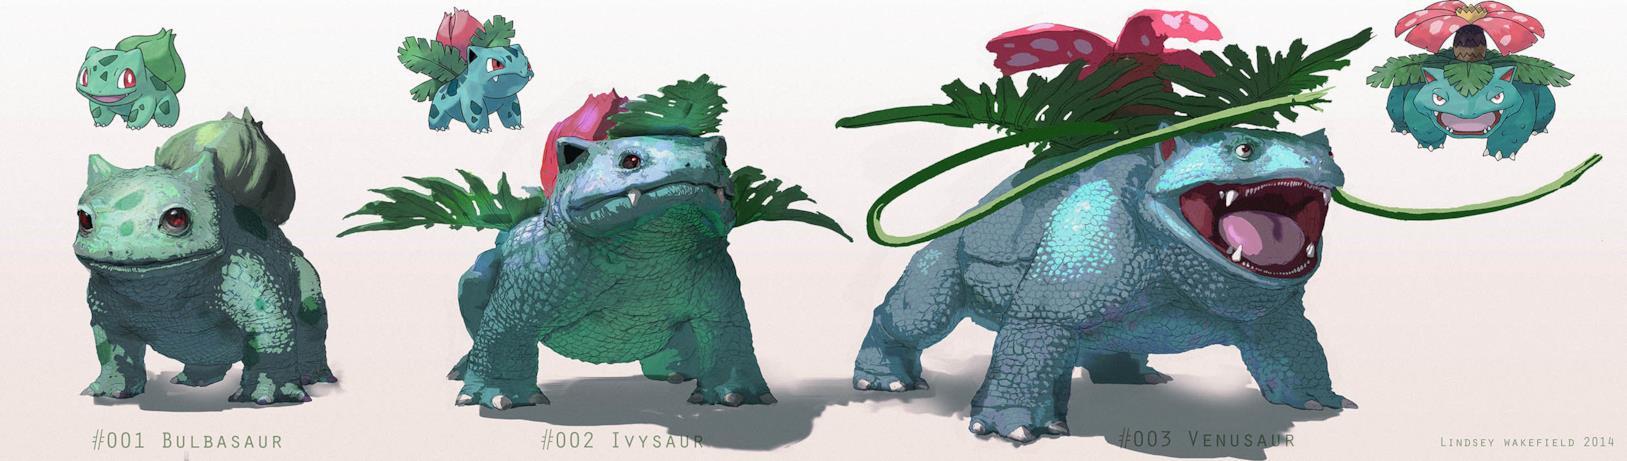 Le iper-realistiche evoluzioni di Bulbasaur disegnate da Lindsey Wakefield